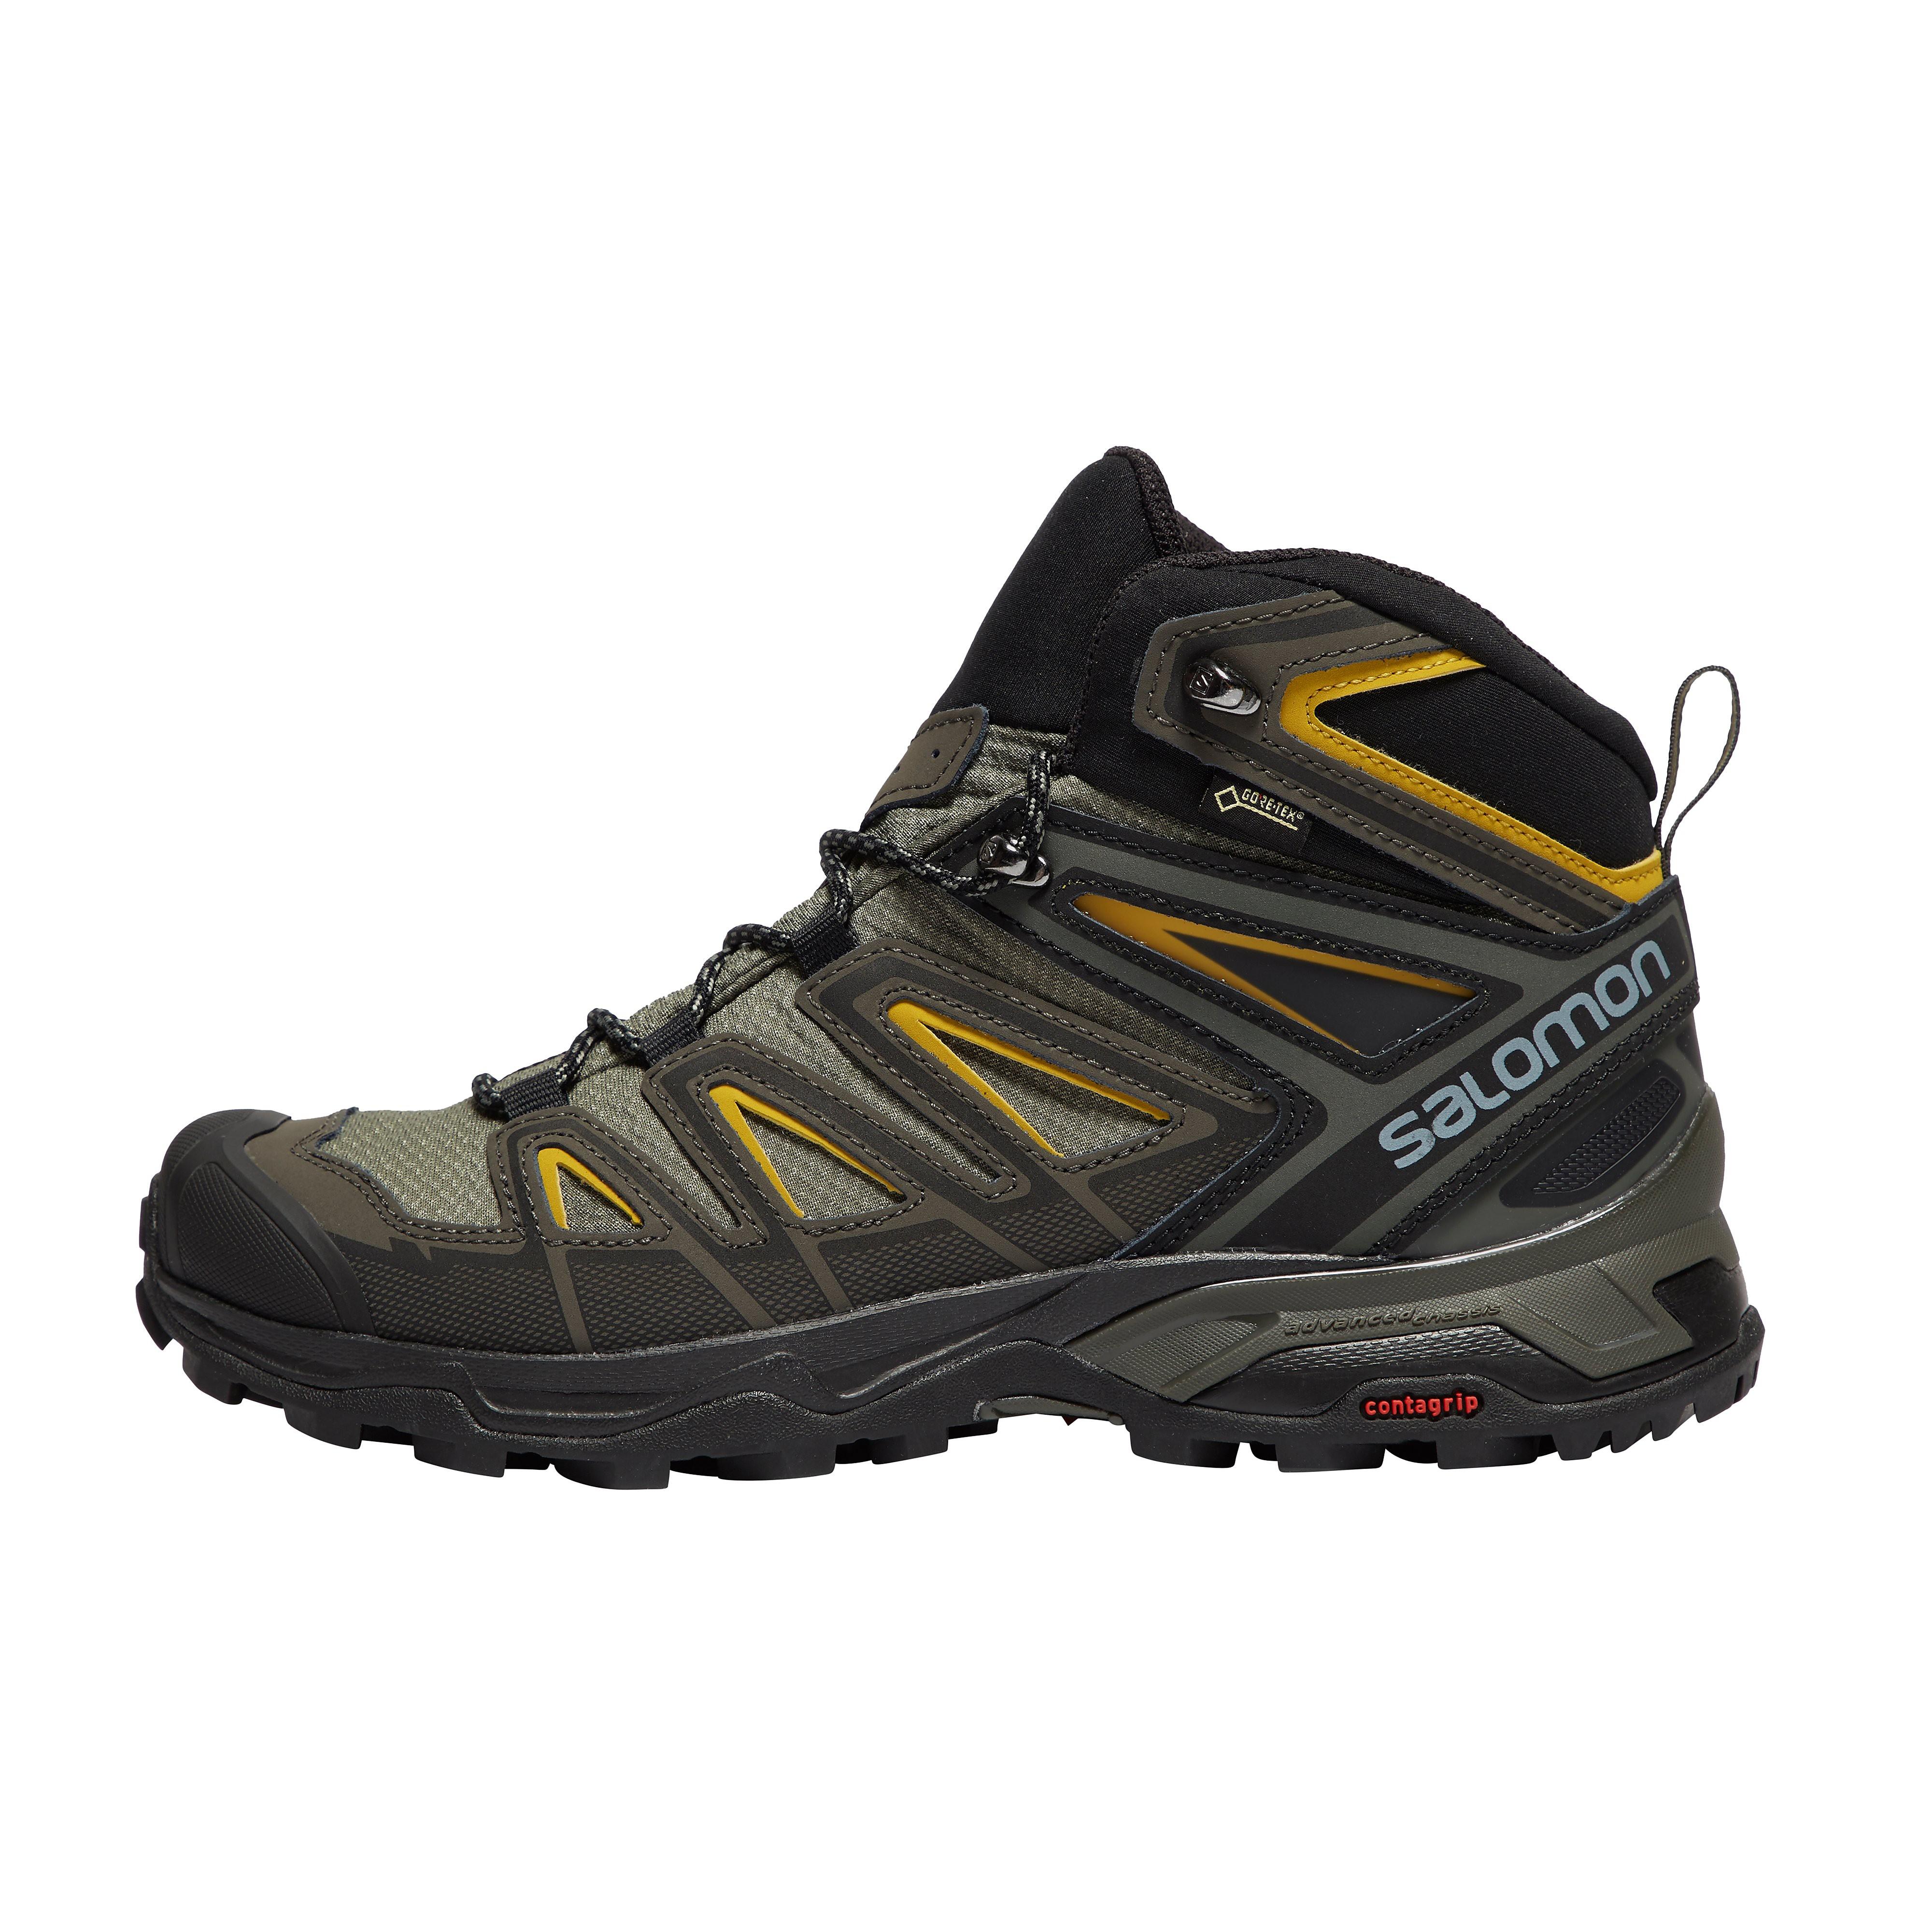 Salomon X ULTRA 3 Mid GTX Men's Hiking Shoes